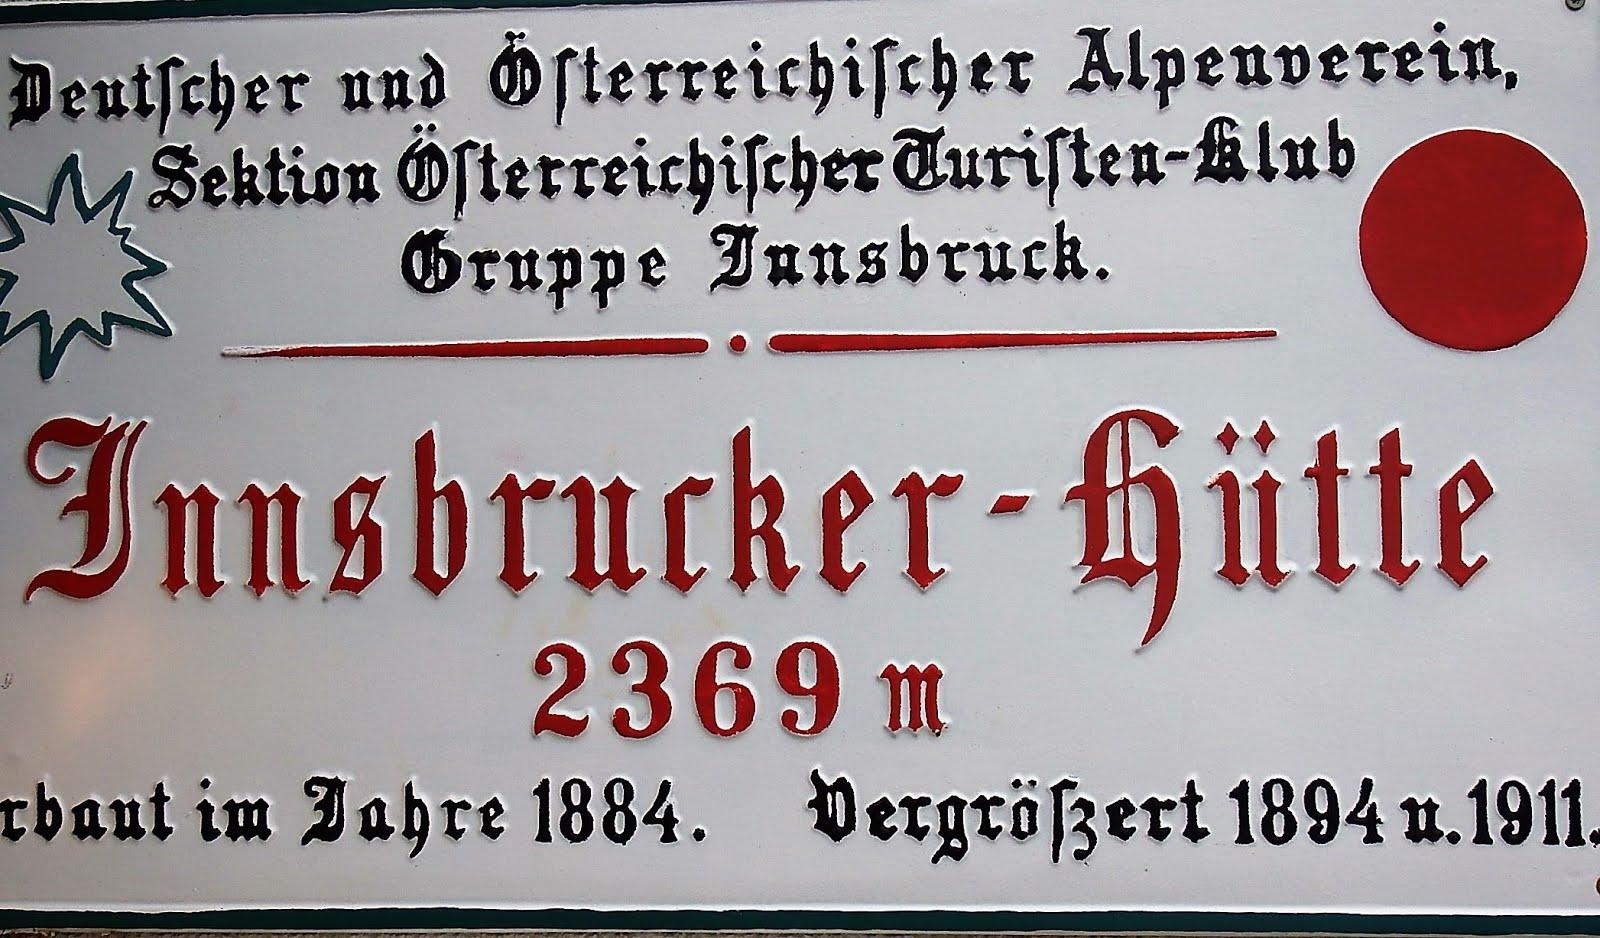 Innsbrucker hutte